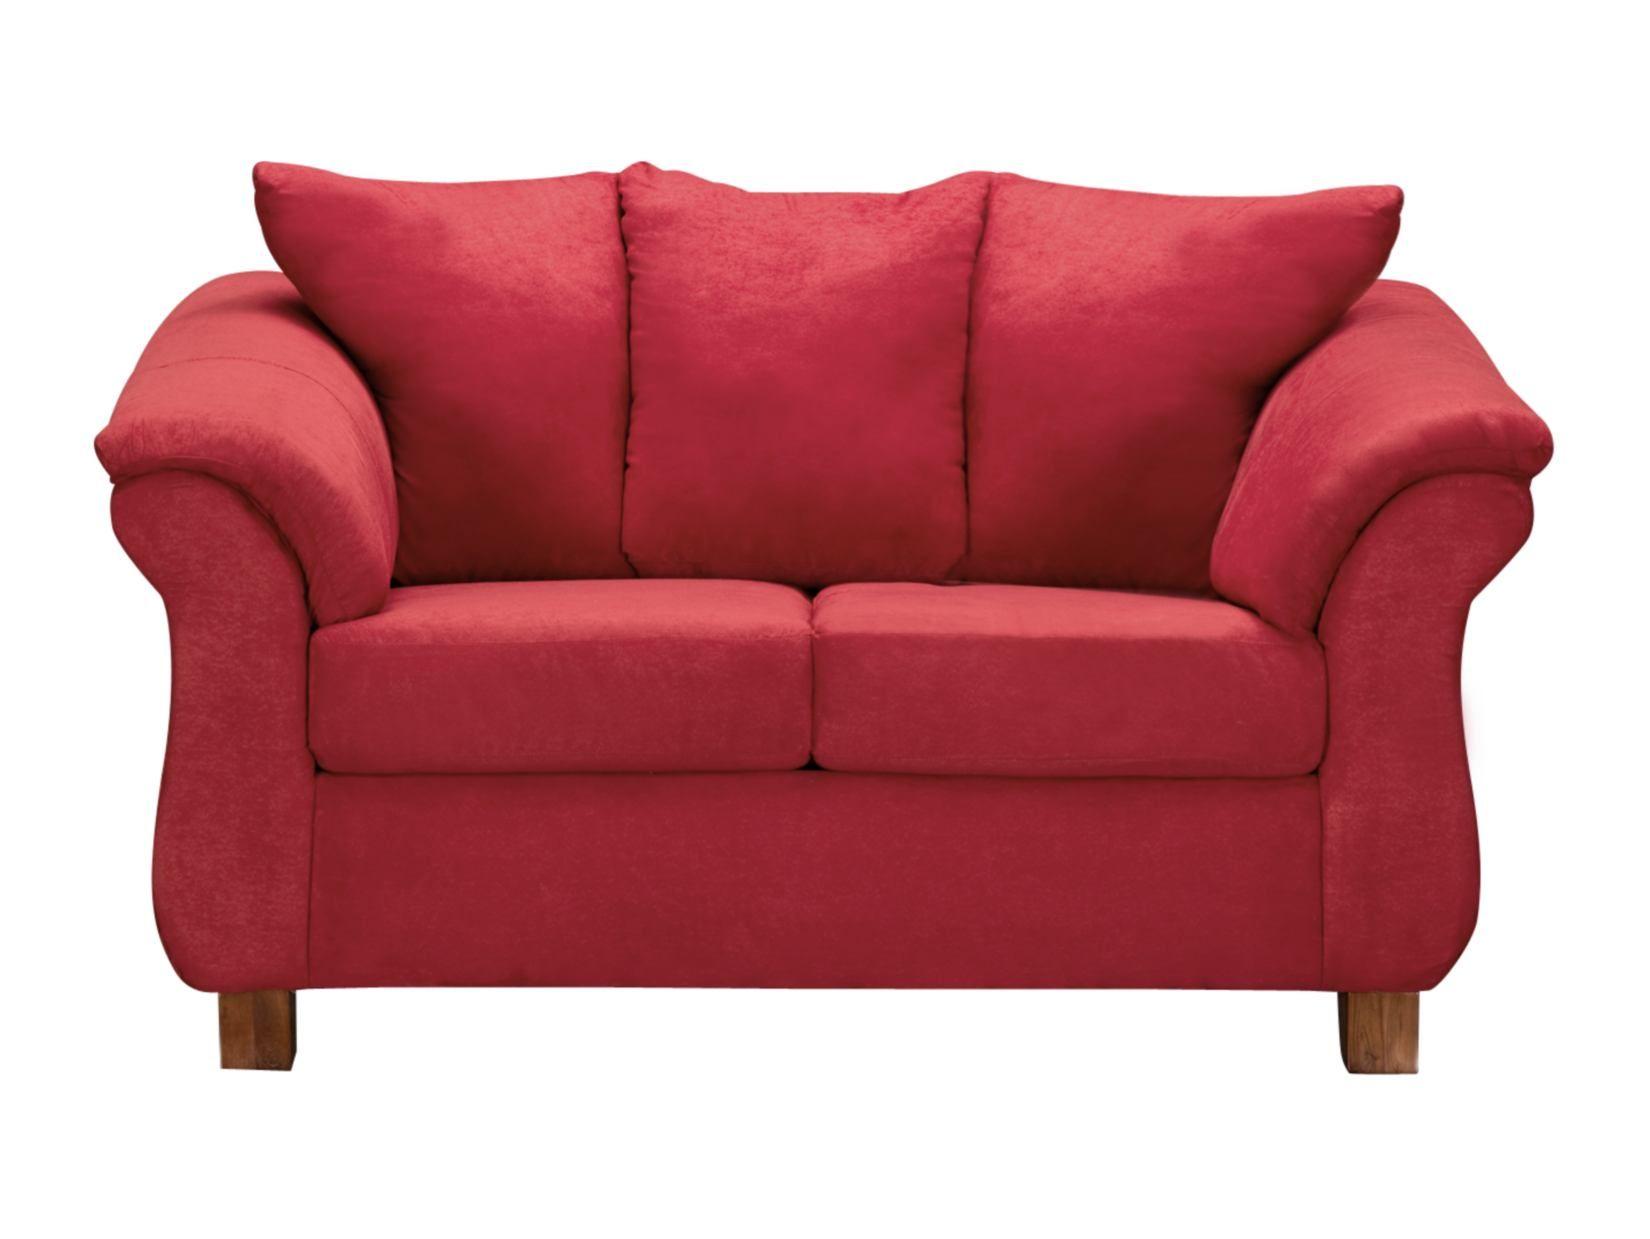 Miraculous Adrian Red Loveseat Value City Furniture Kawaii Home Short Links Chair Design For Home Short Linksinfo